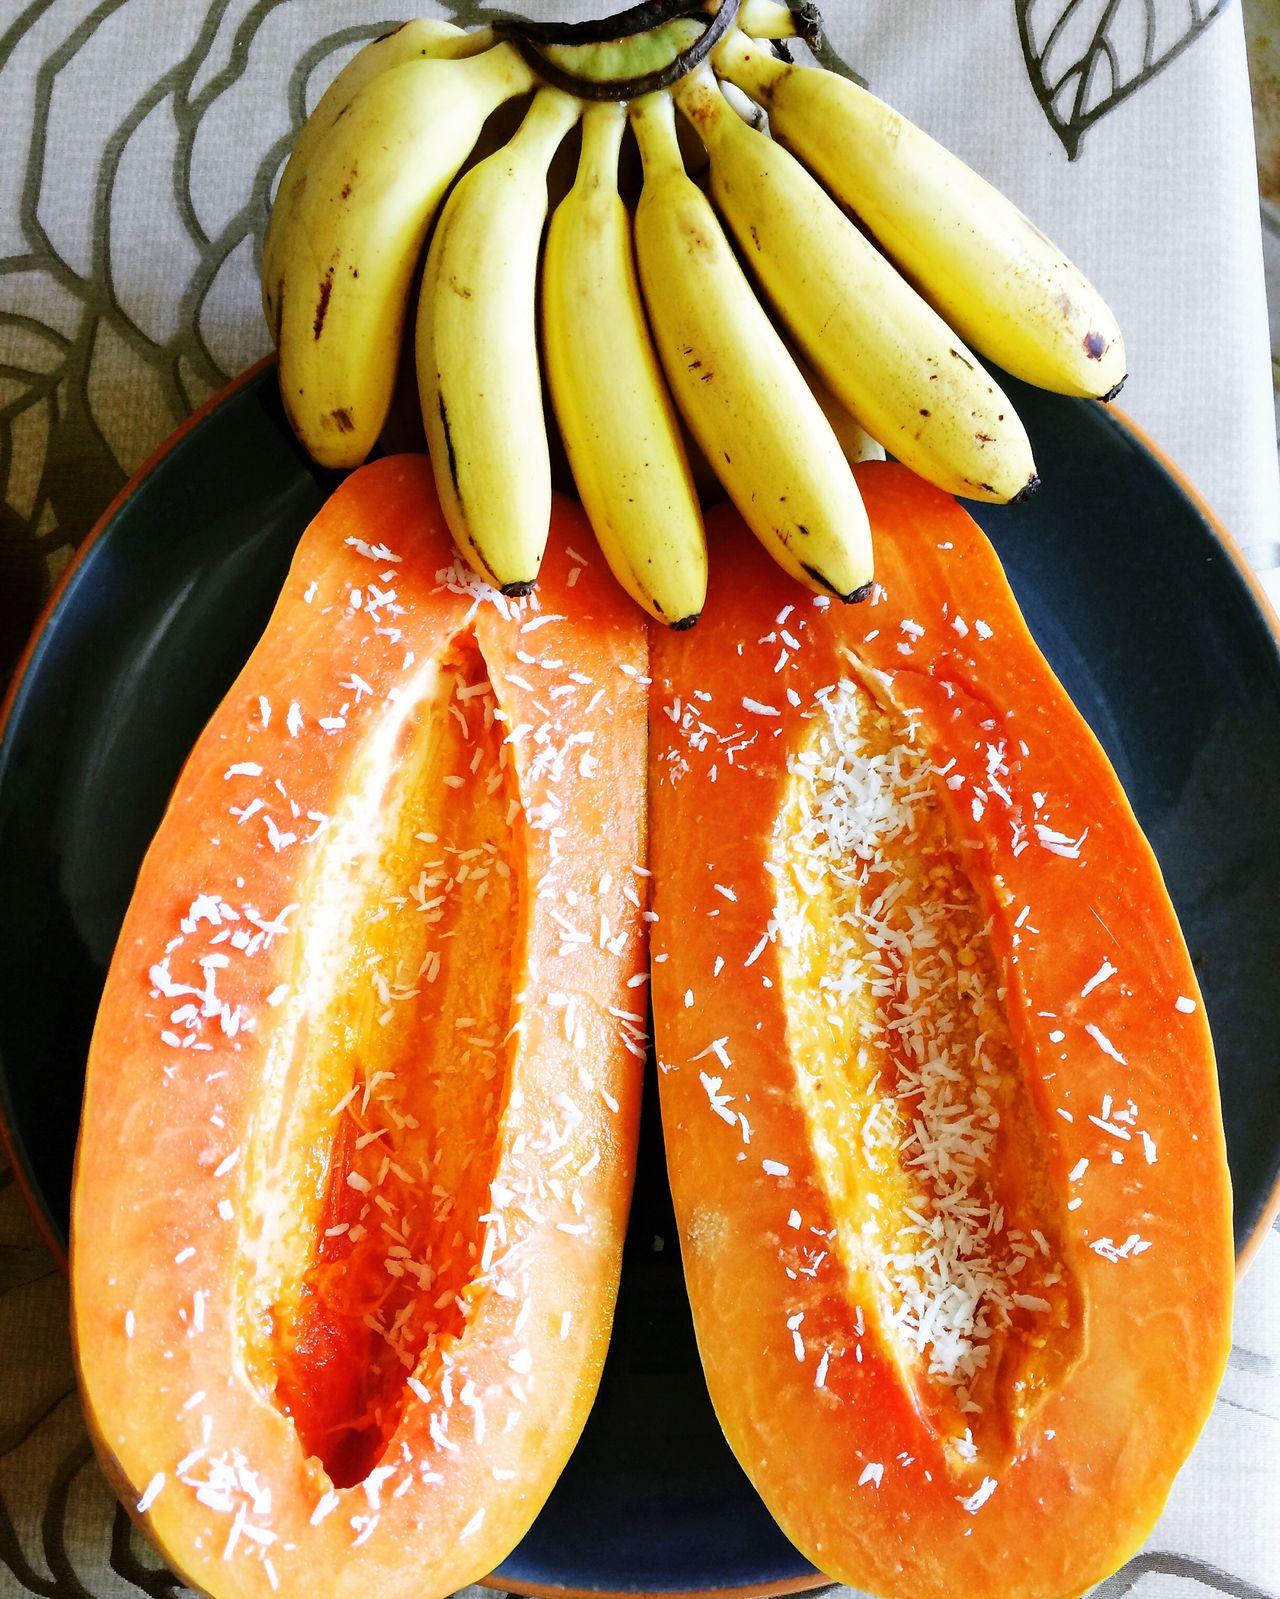 Breakfast Fruit Fruitporn Exotic Fruits Exotic Healthy Healthy Eating Healthy Lifestyle Healthy Food Papaya Baby Bananas Shredded Coconut Plate Of Fruits Hawaiian Fresh Organic Fresh Produce